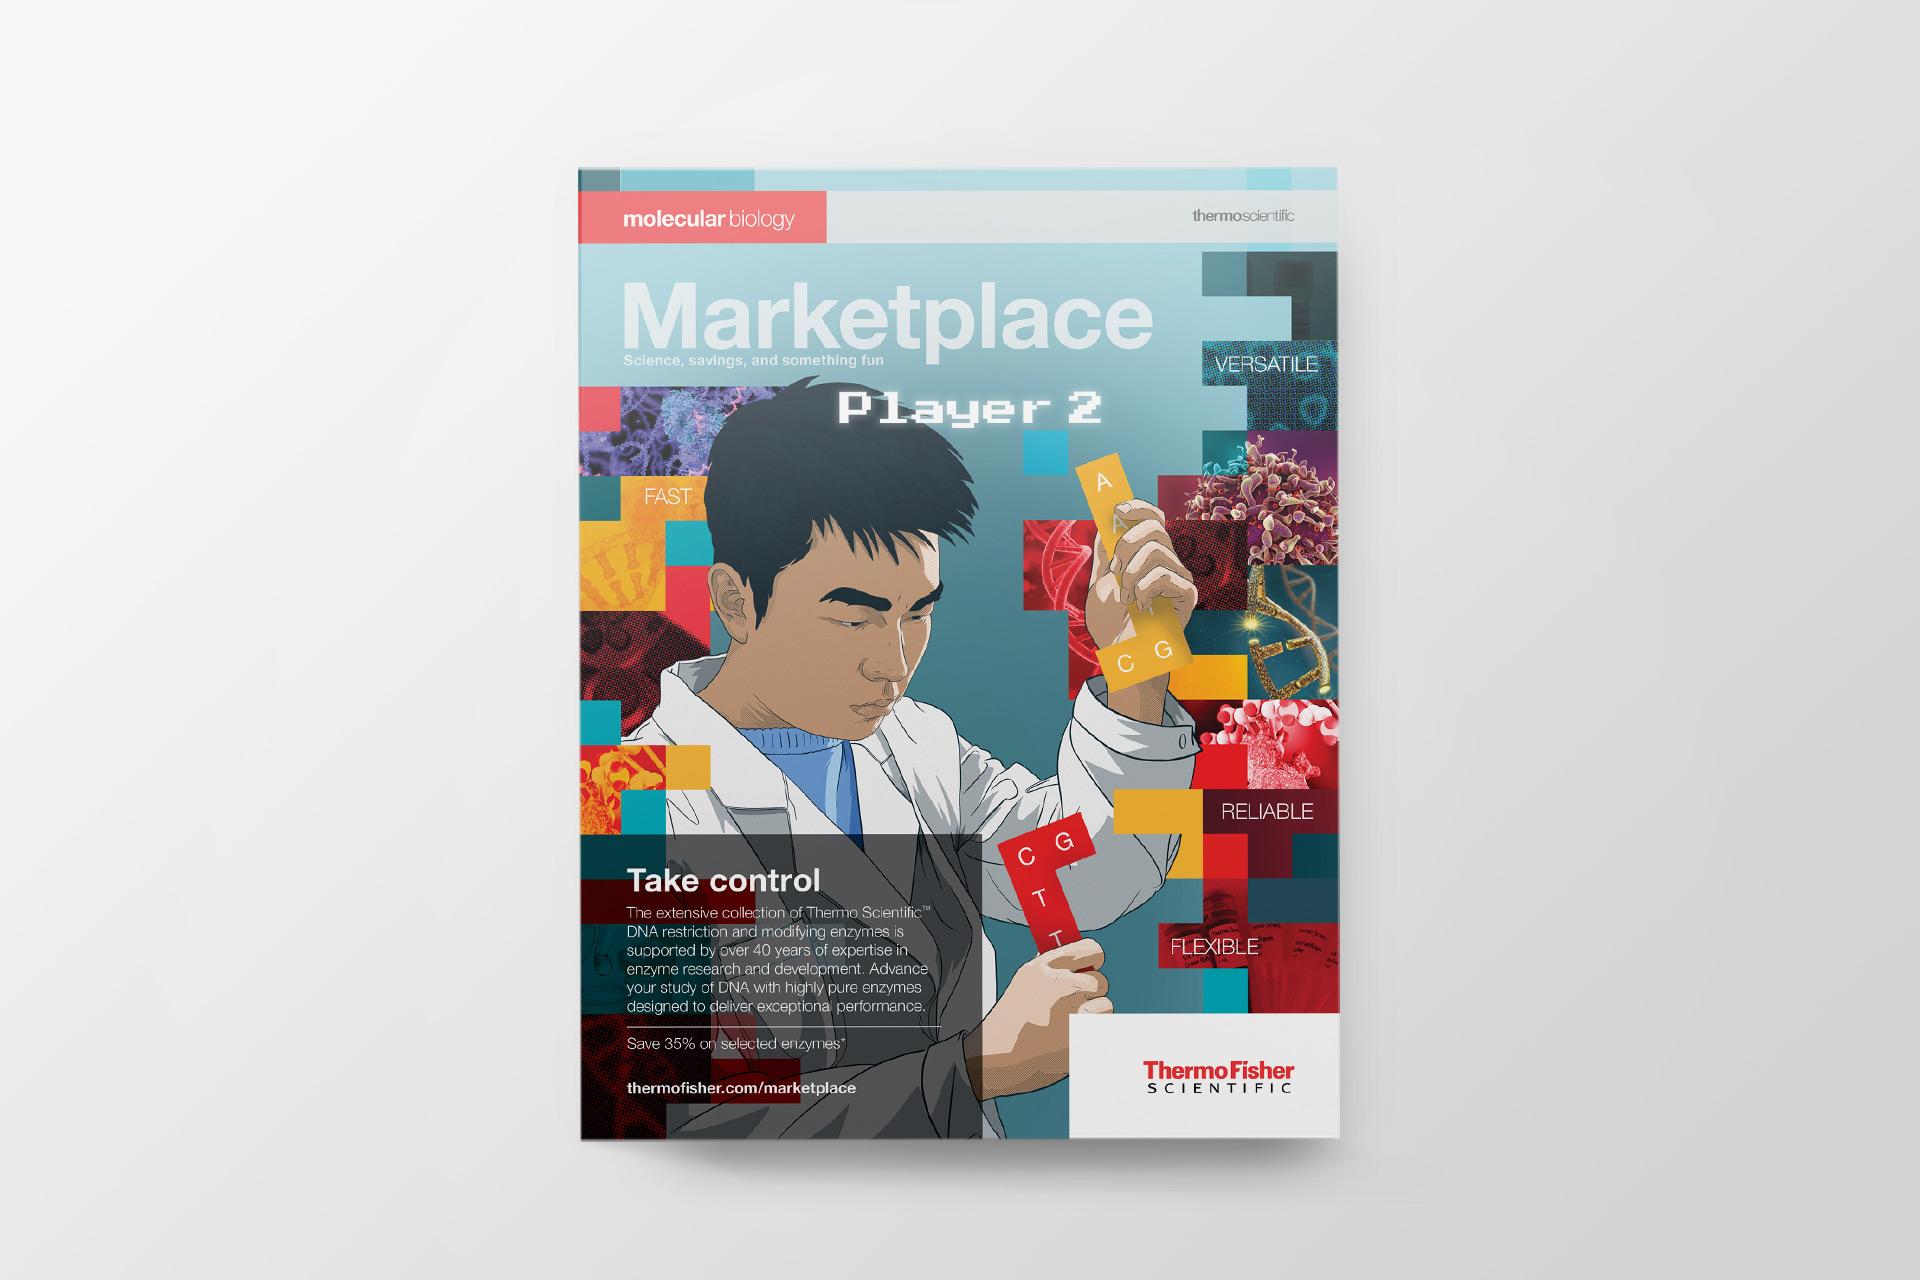 BON_TFS_marketplace_2_cover.jpg